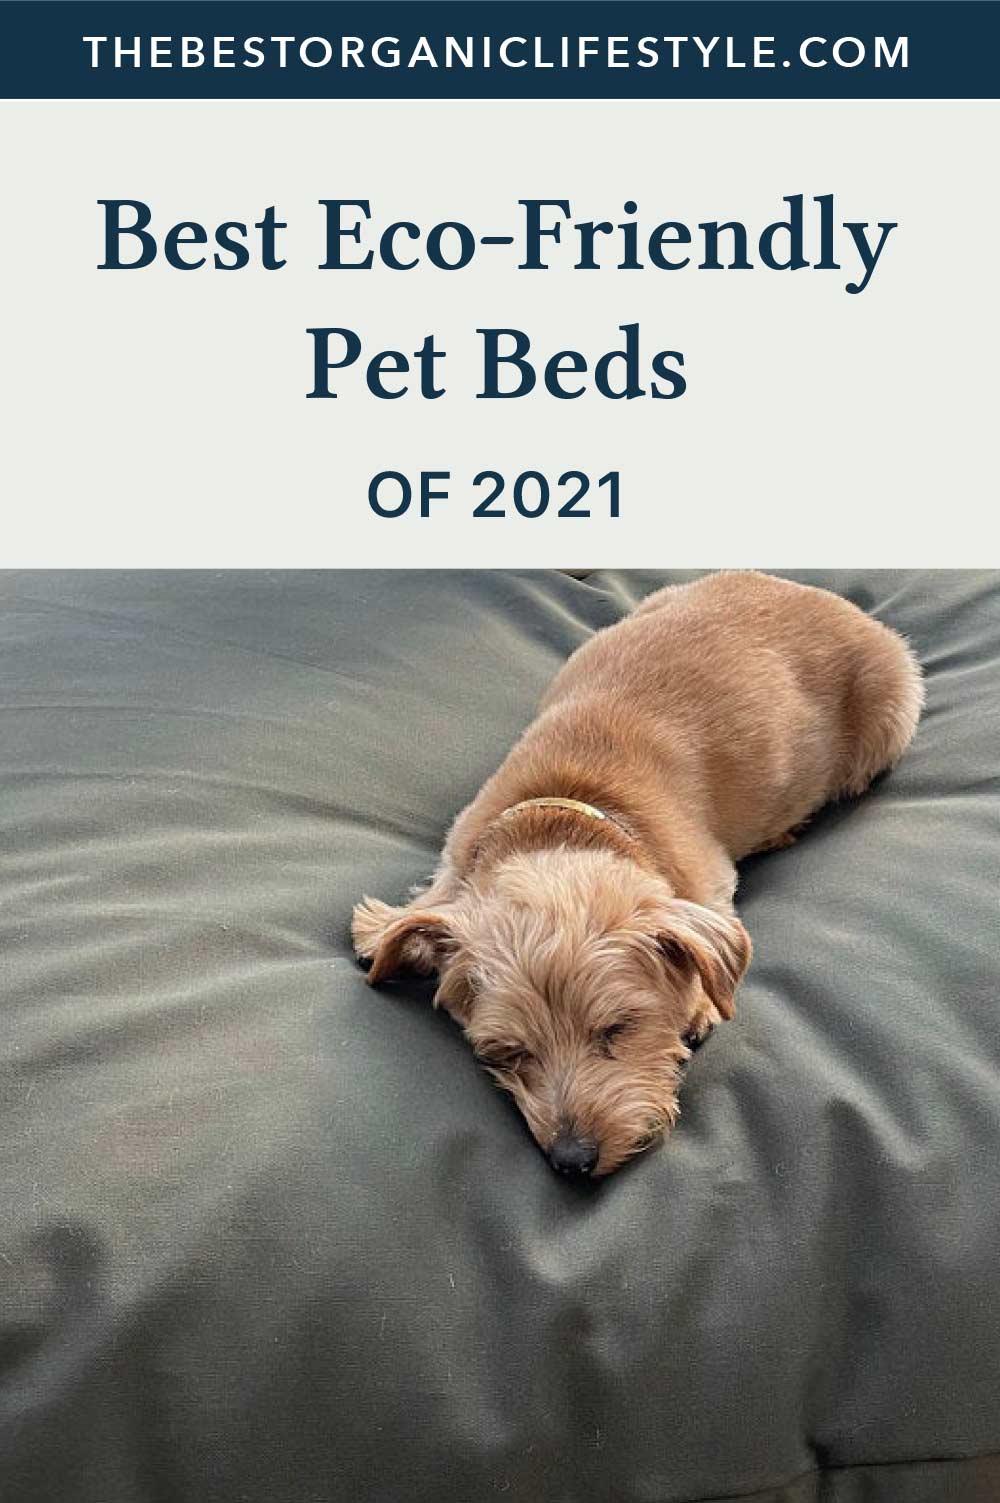 Best Eco-Friendly Pet Beds of 2021